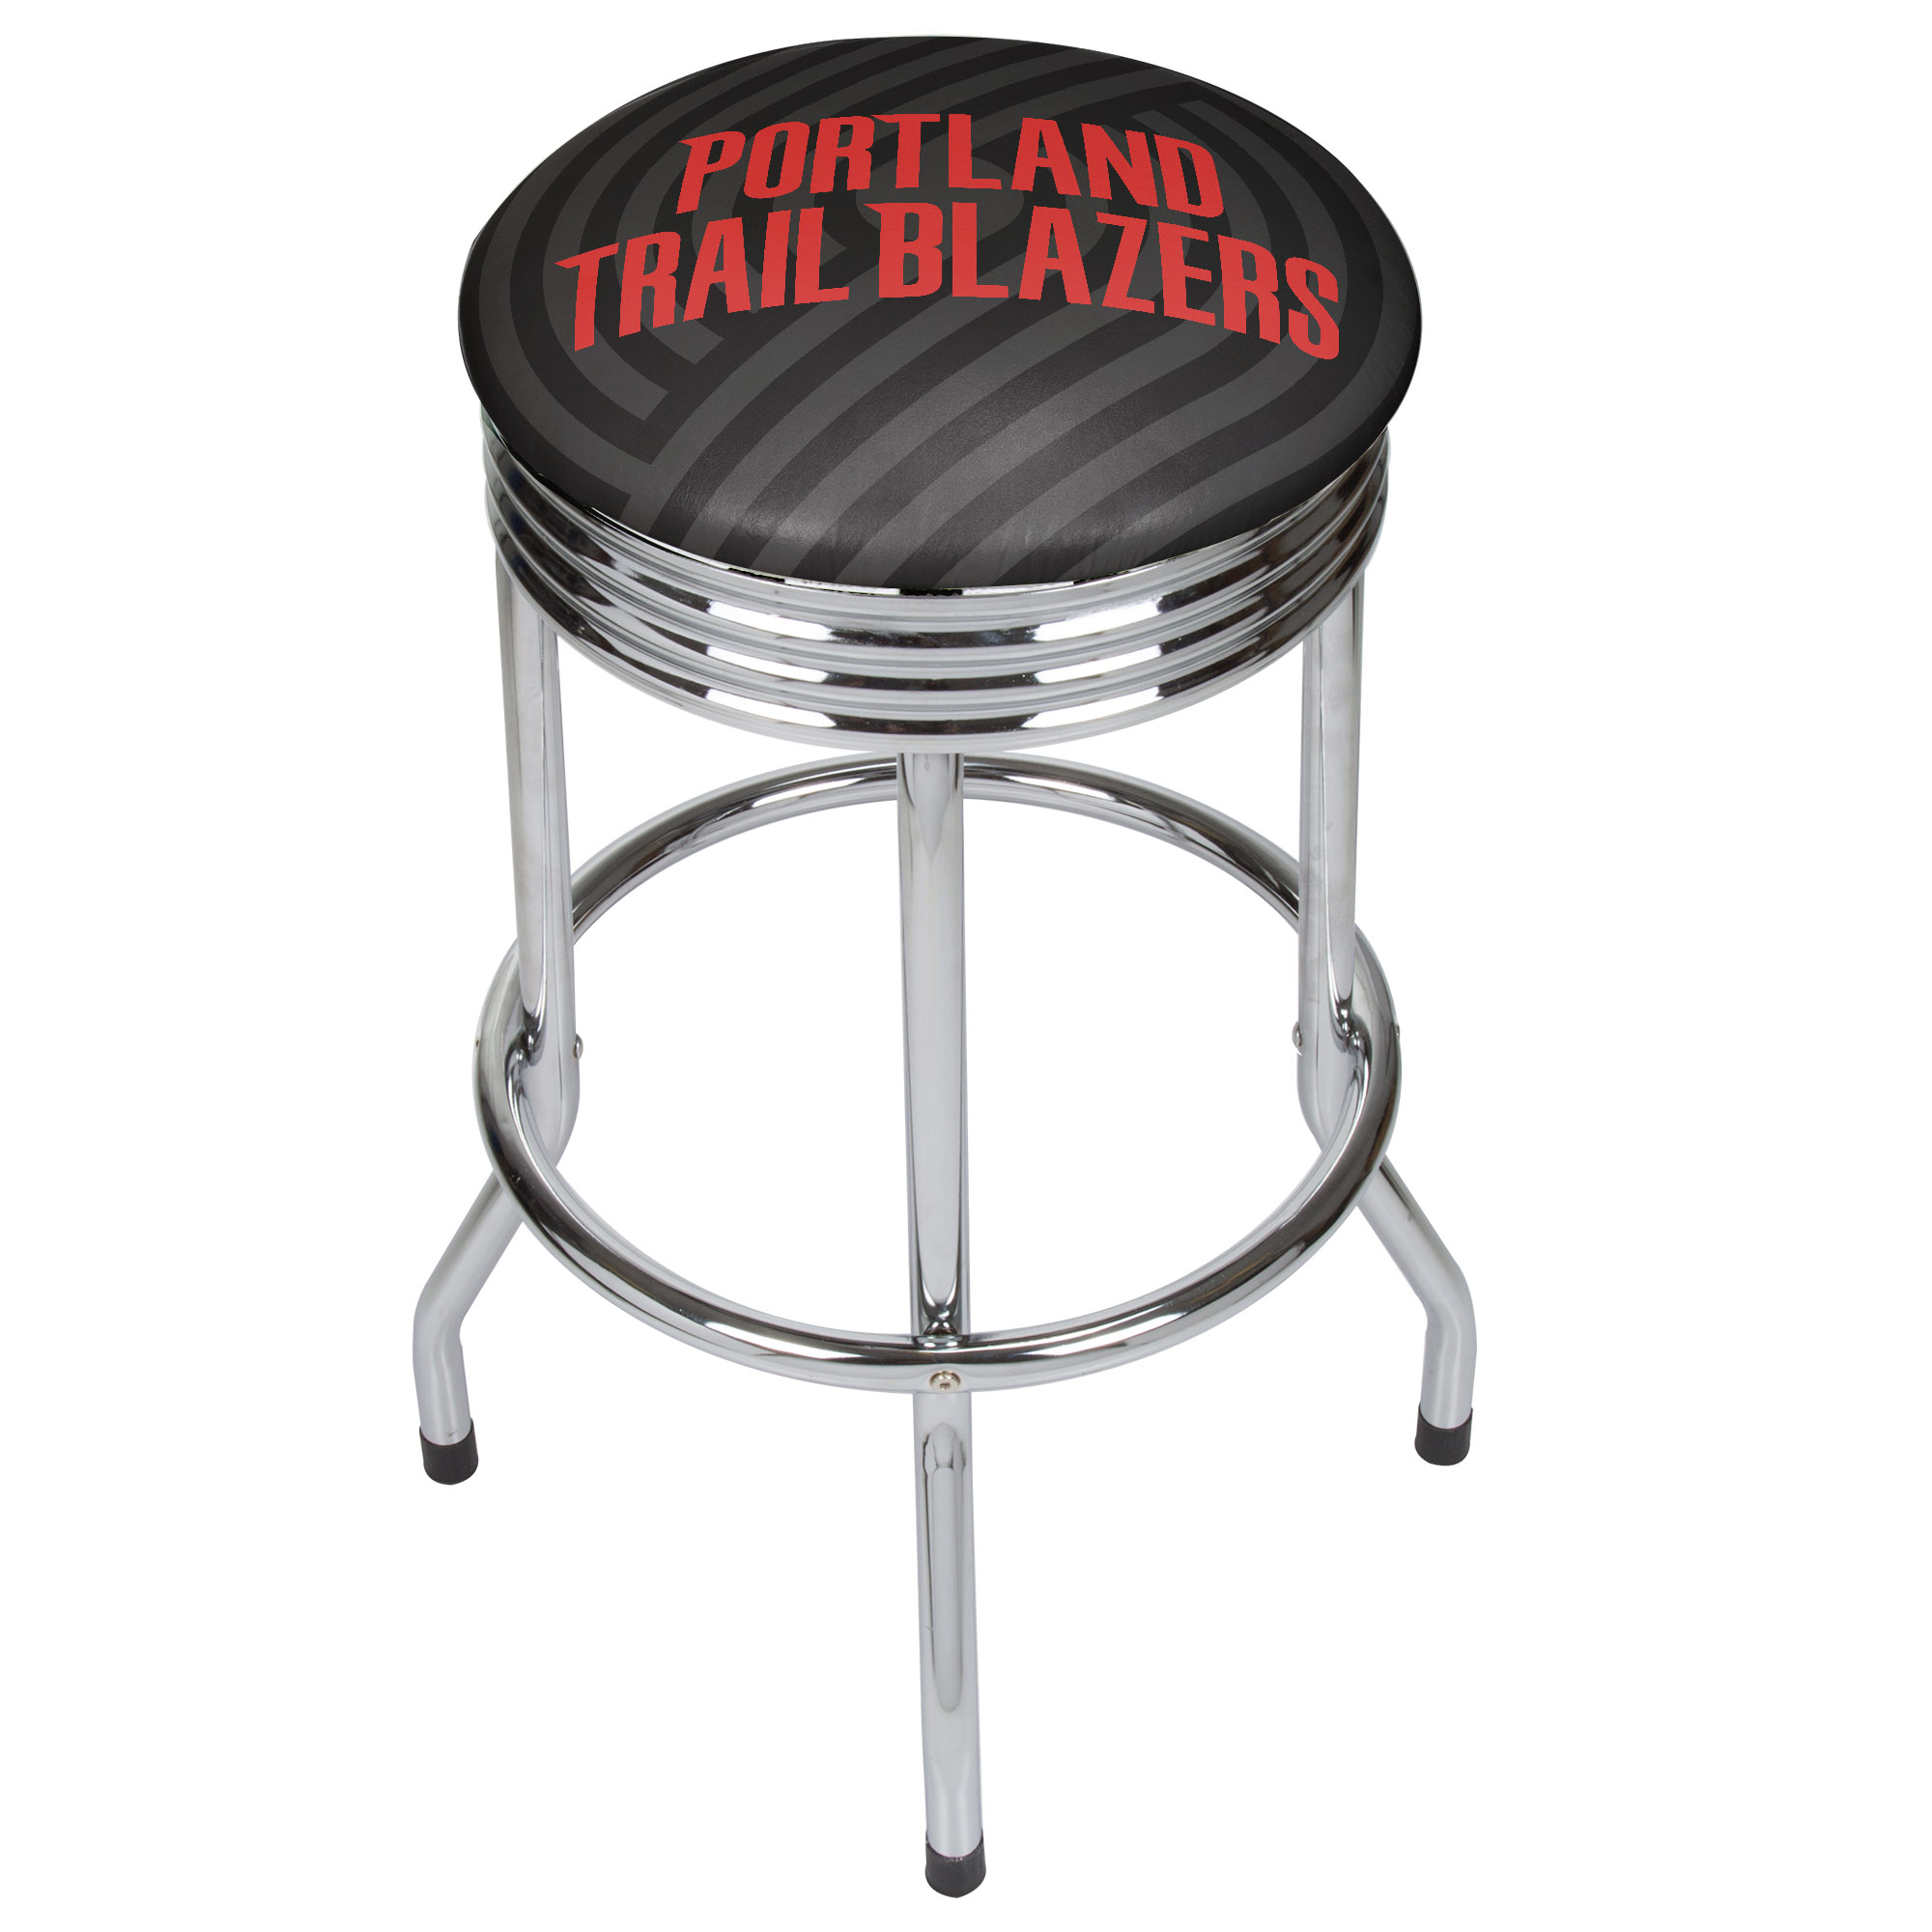 NBA Chrome Ribbed Bar Stool - Fade - Portland Trailblazers